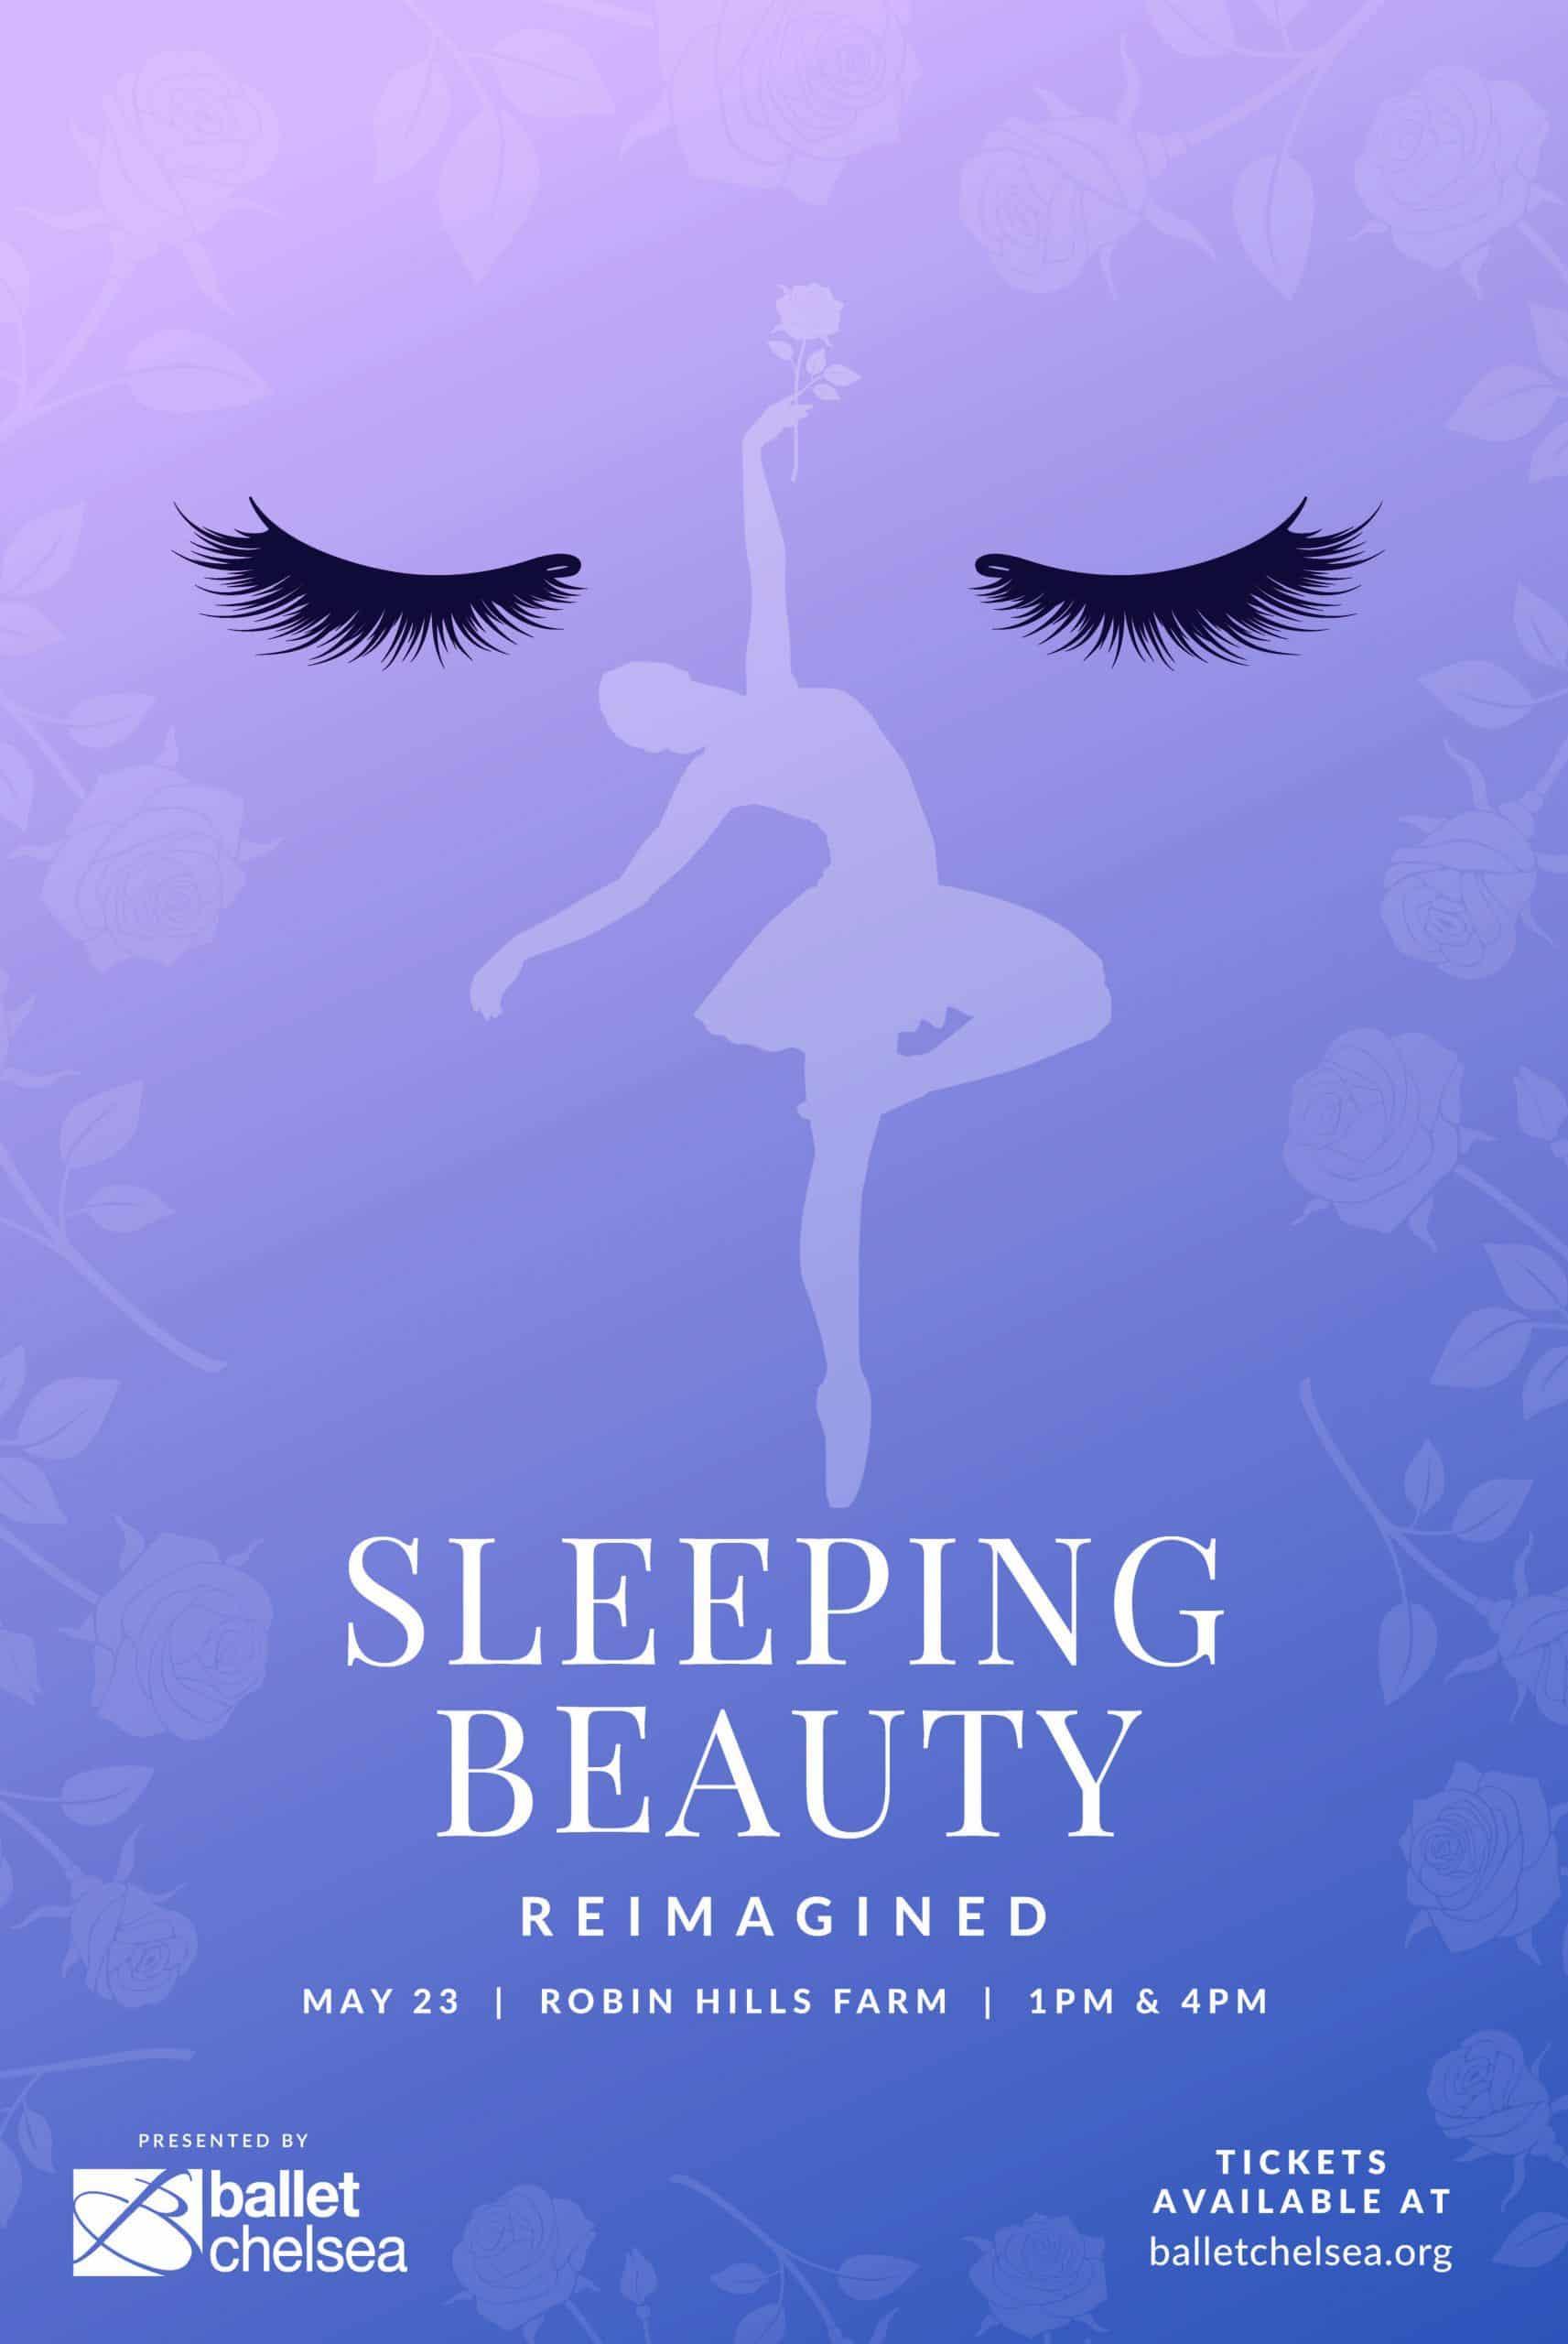 SleepingBeauty2021_Poster_24x36